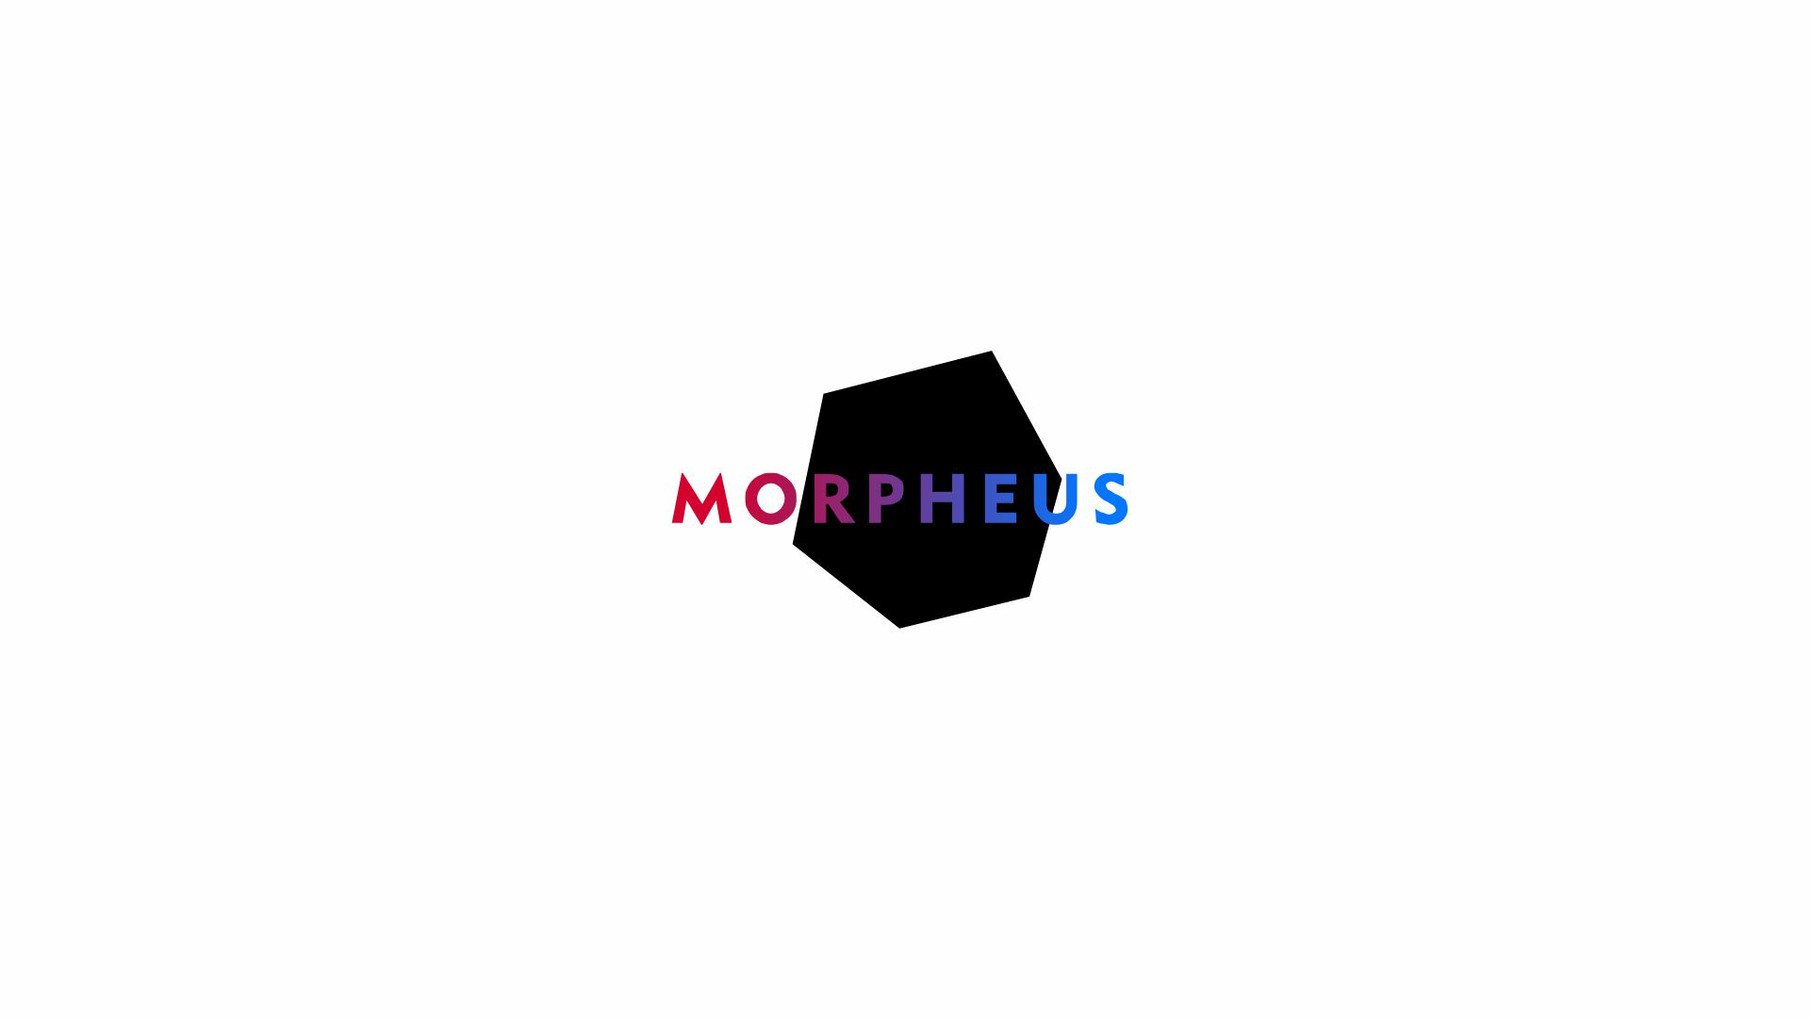 morf7.jpg